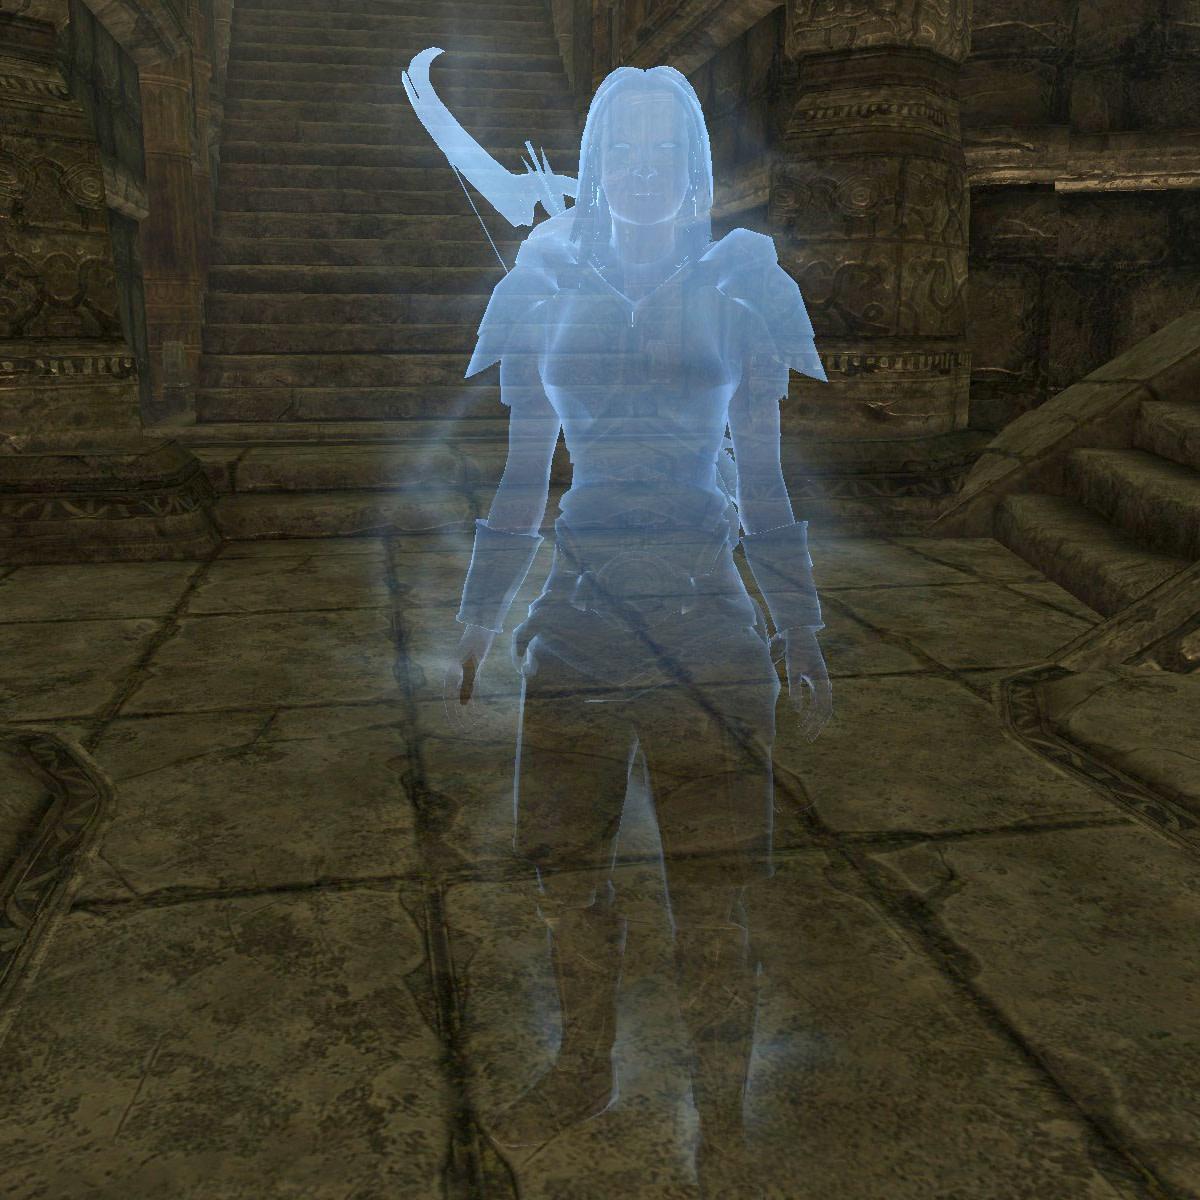 Katria from Elder Scrolls 5 Skyrim